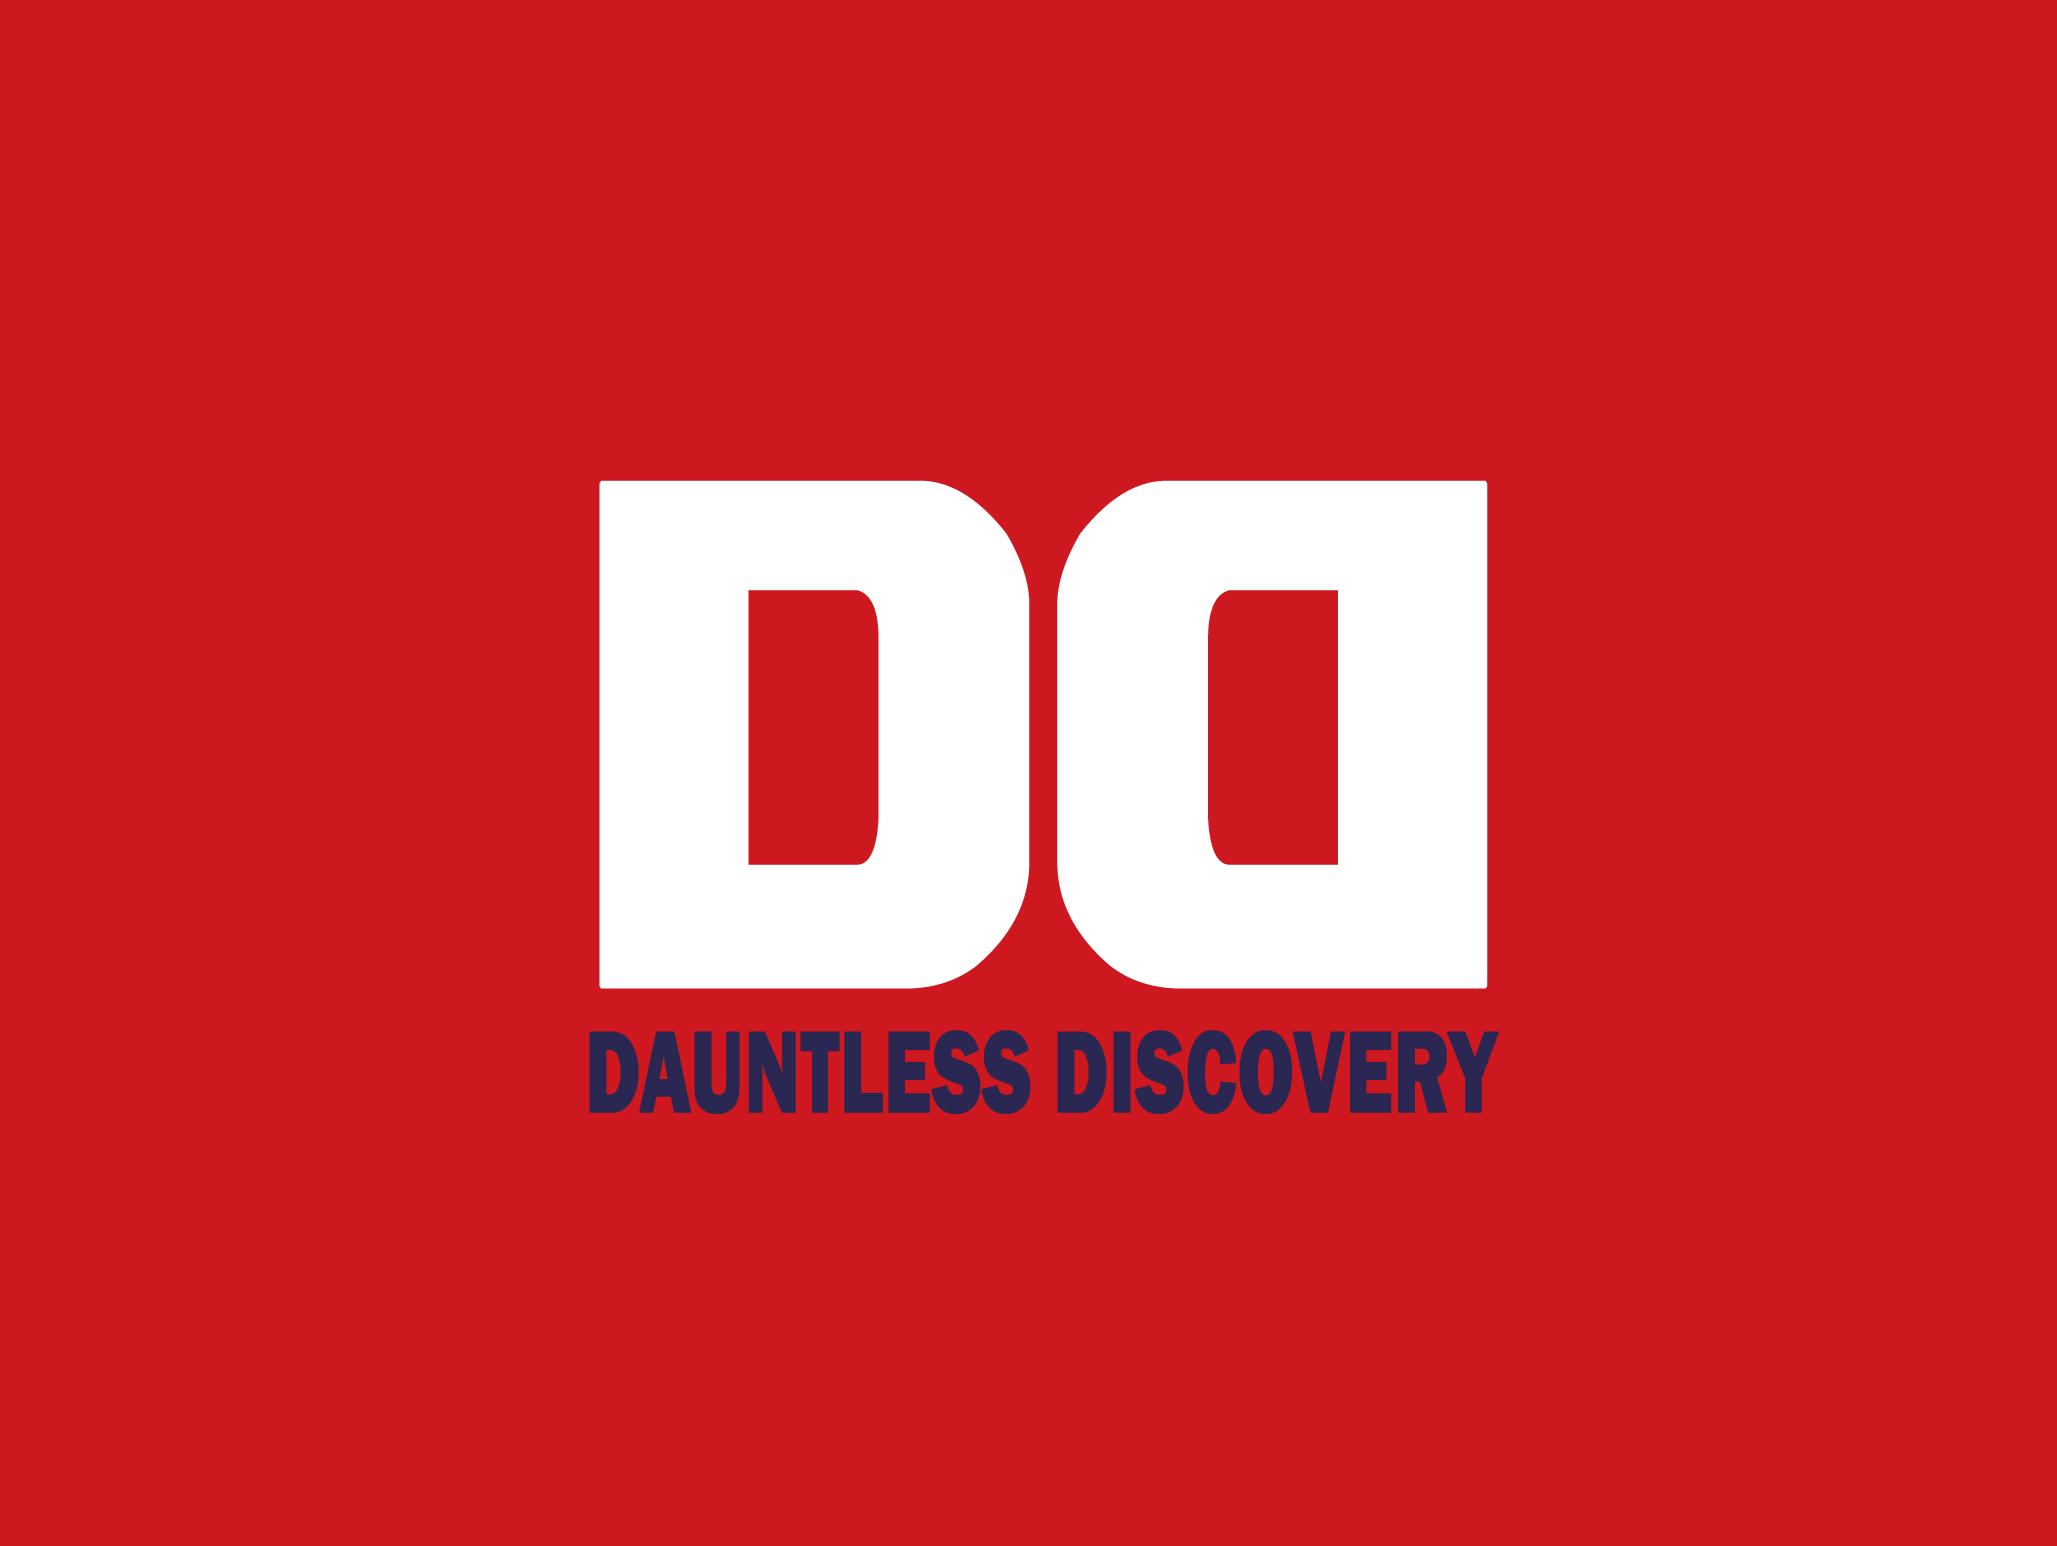 Leadership Team - Dauntless Discovery